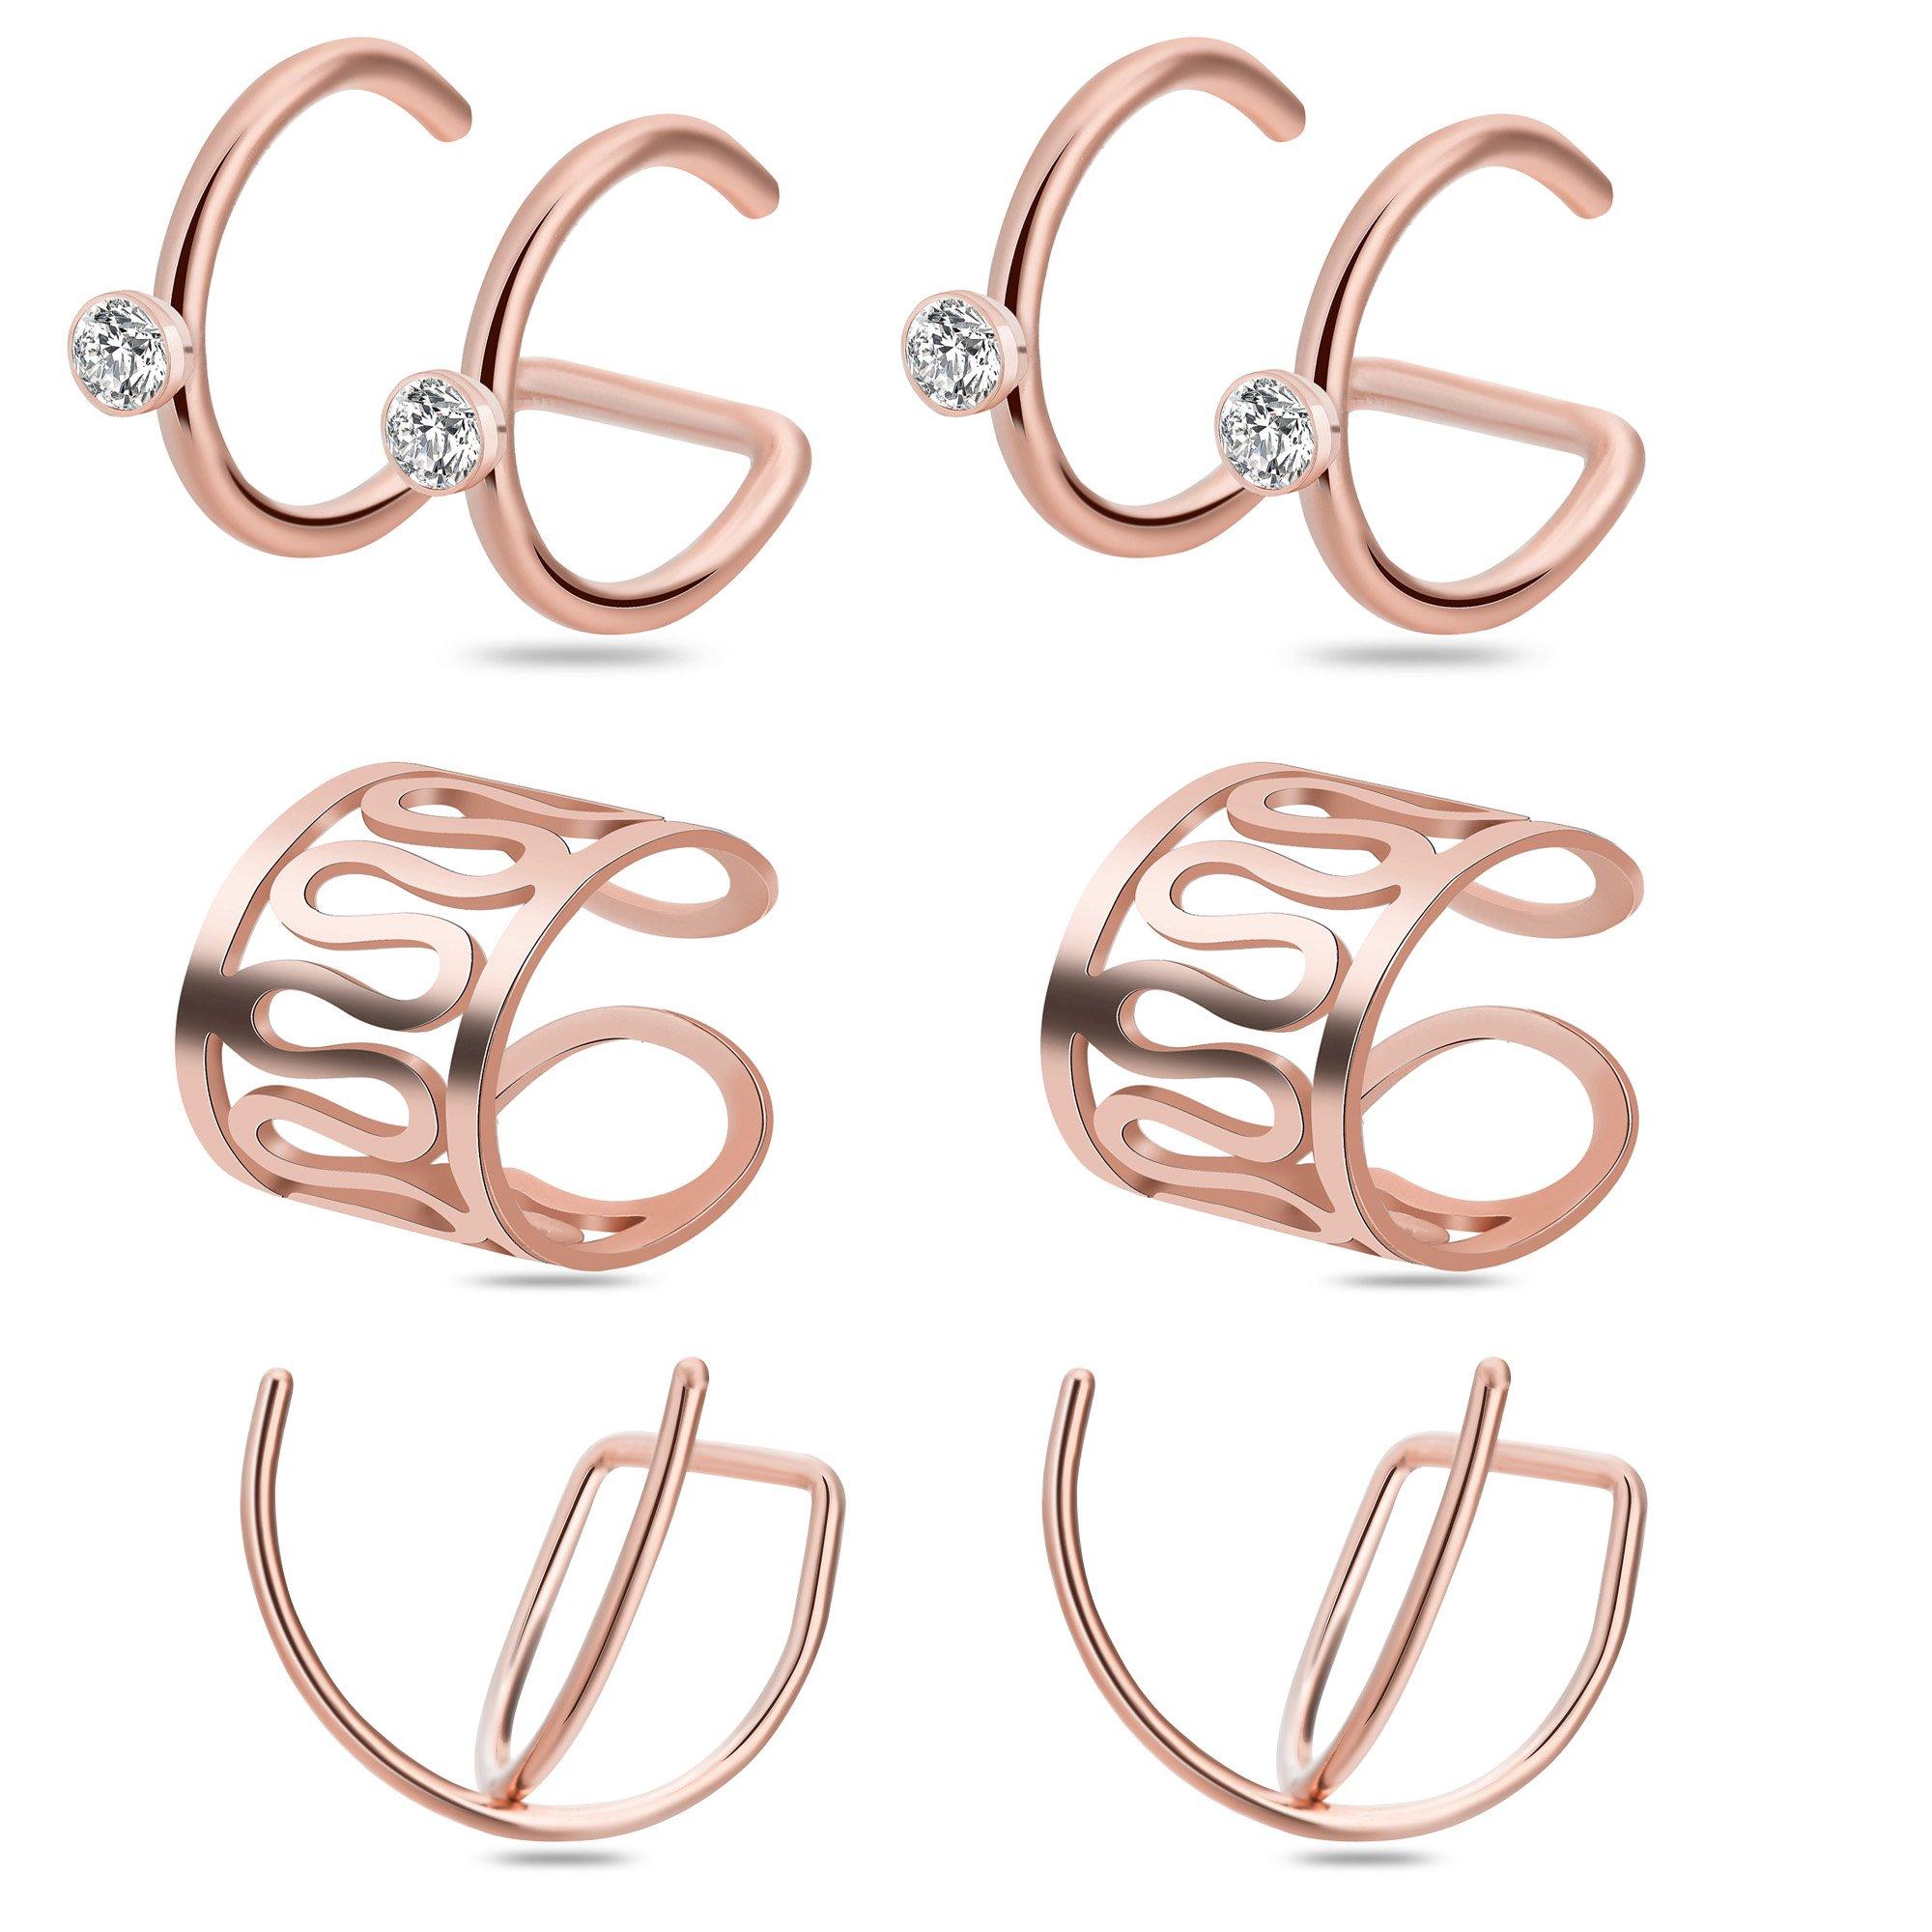 Ear Cuff,Valloey 3 Pairs Stainless Steel Zircon Cartilage Helix Hoop Non Piercing Earring Ear Clips